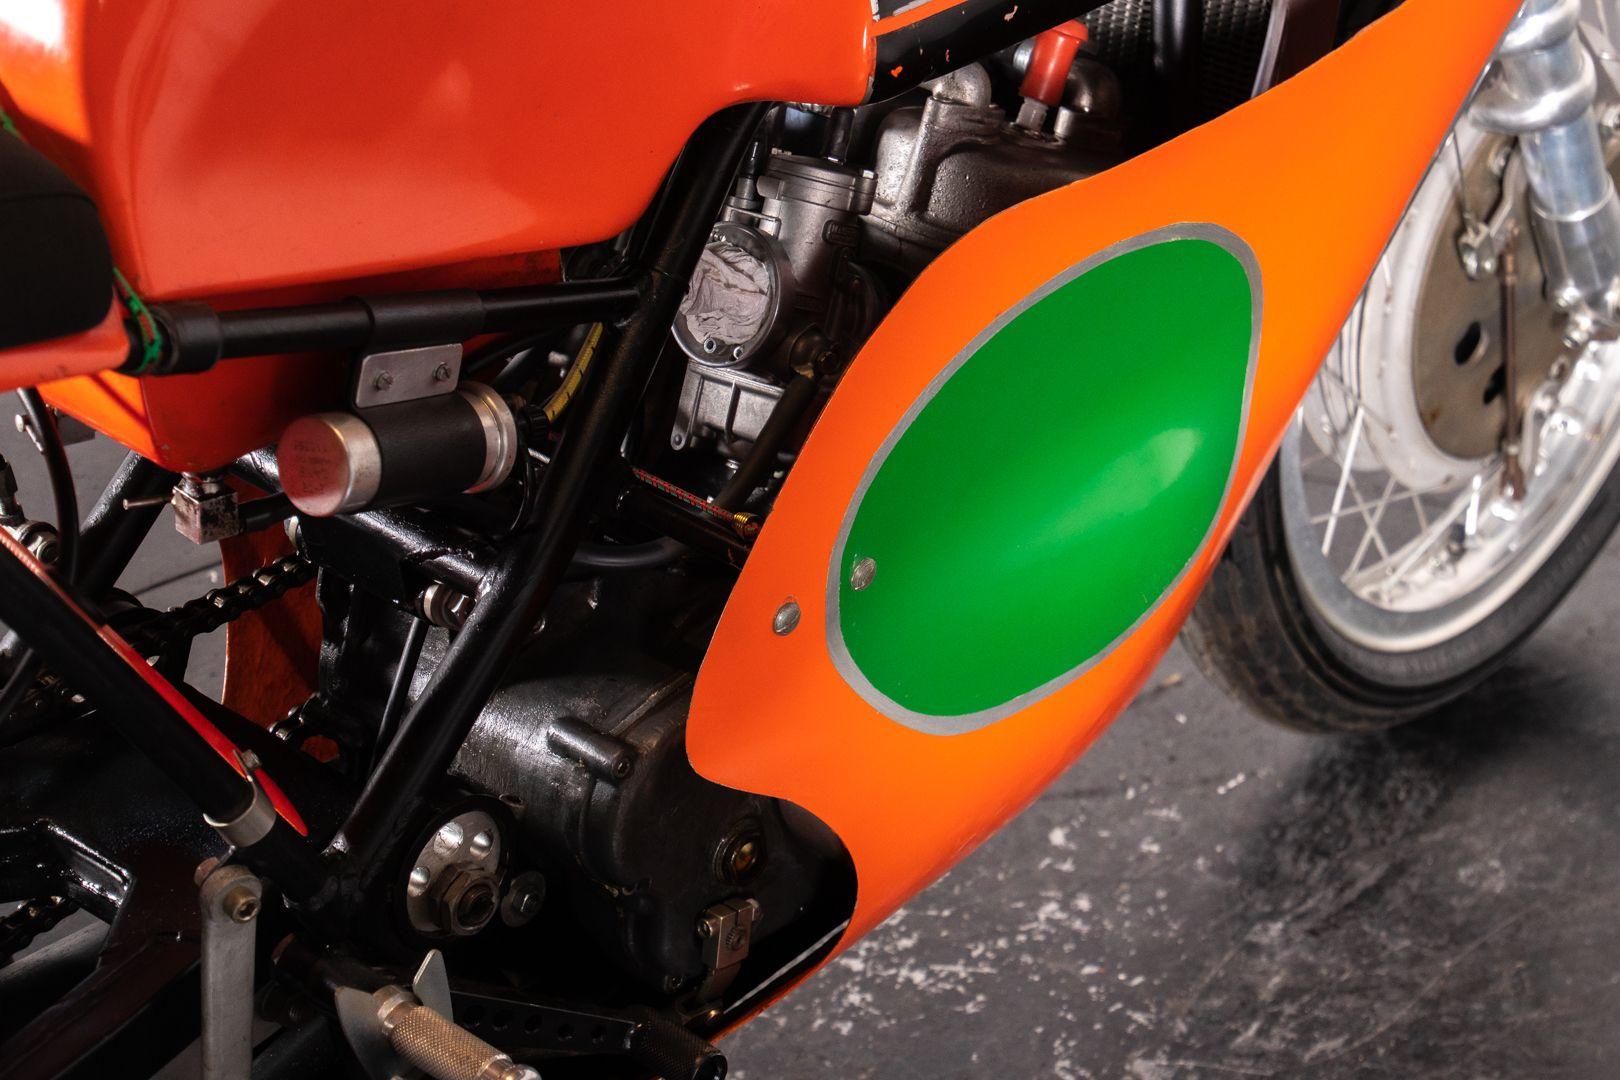 1974 HARLEY DAVIDSON 250 RR 51565